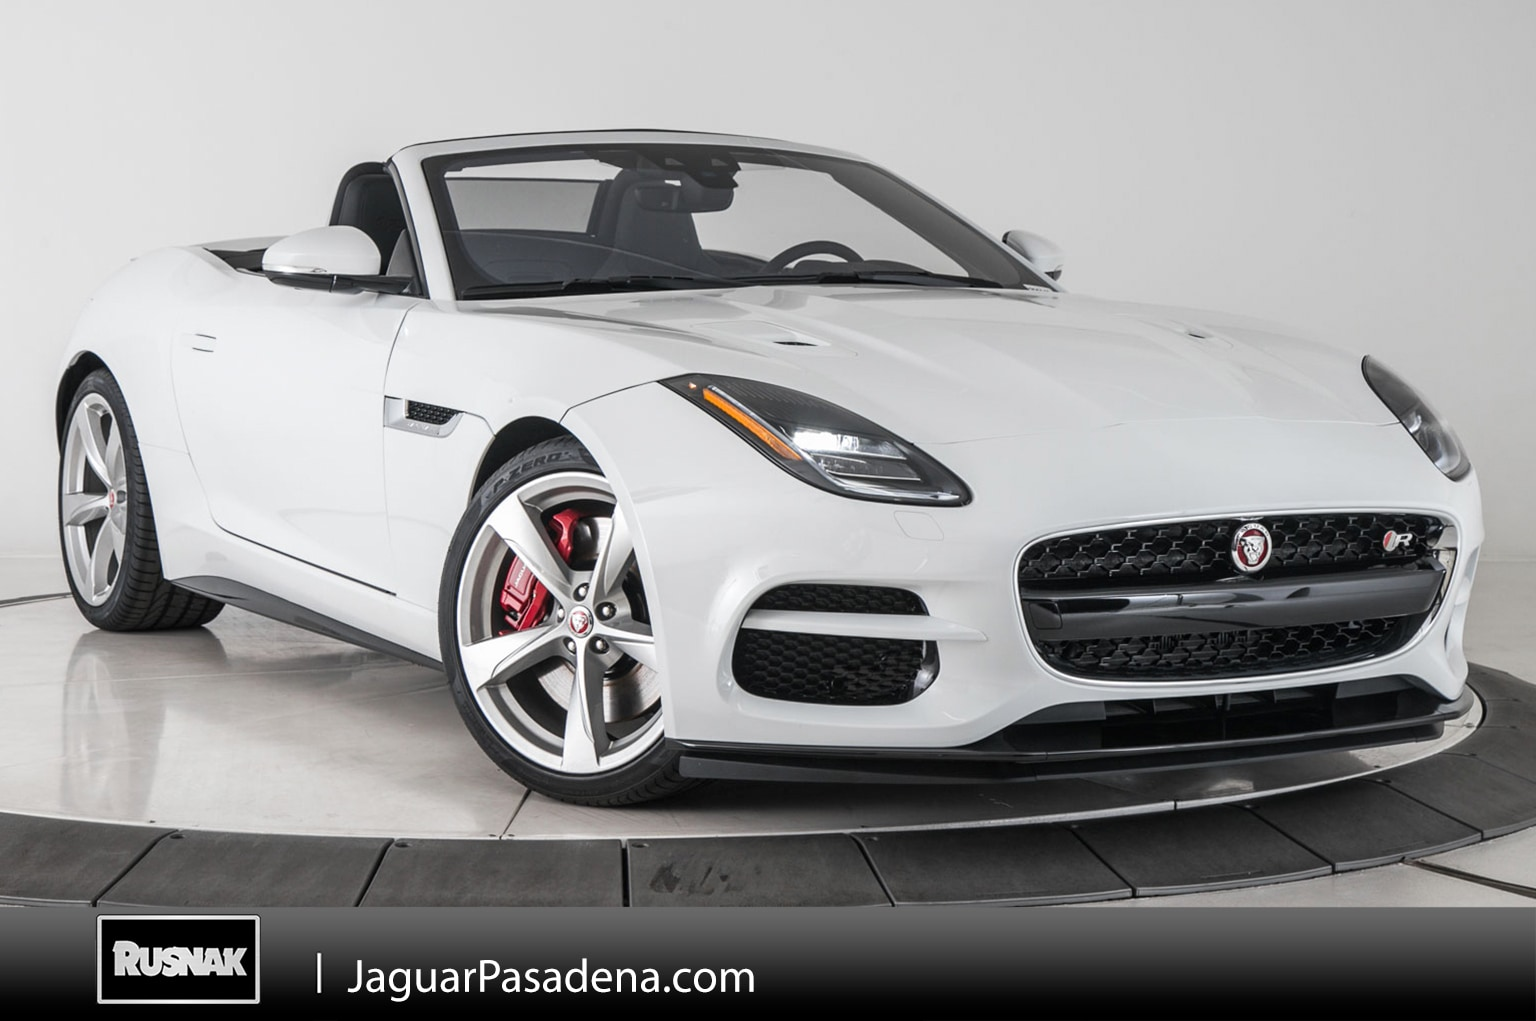 New 2019 Jaguar F-TYPE Convertible For Sale Los Angeles California